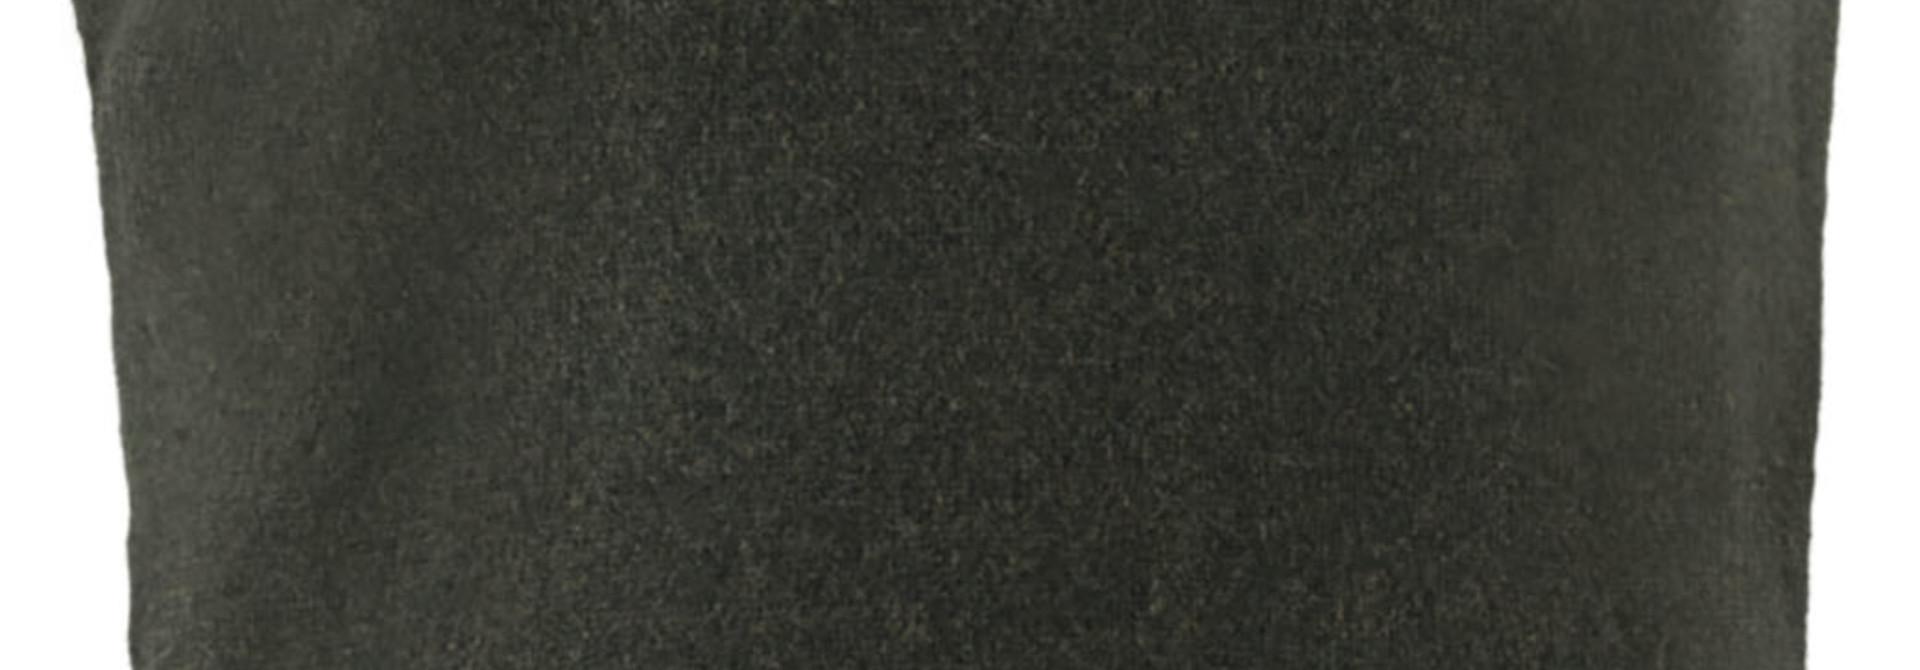 Fjällräven Övik Wool Vest M Dark Olive